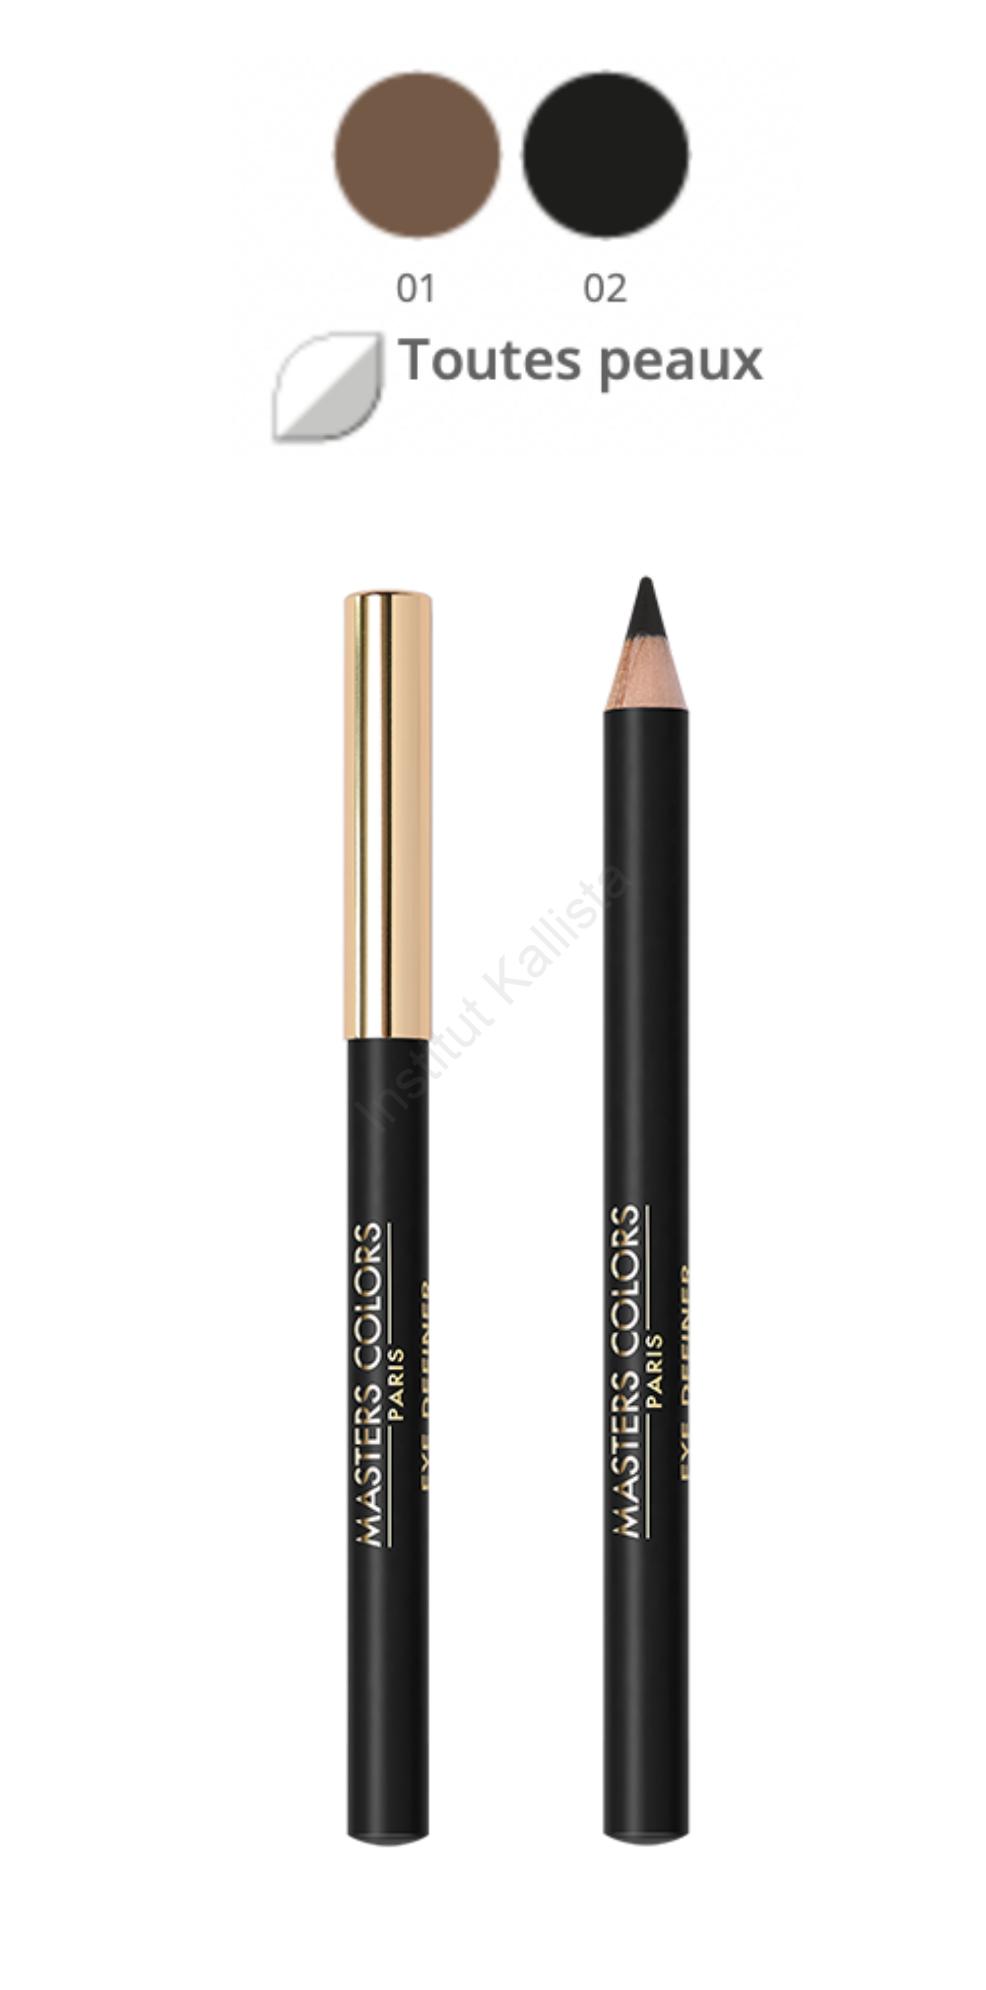 Crayon yeux : Eye definer - Masters Colors, 2 teintes au choix